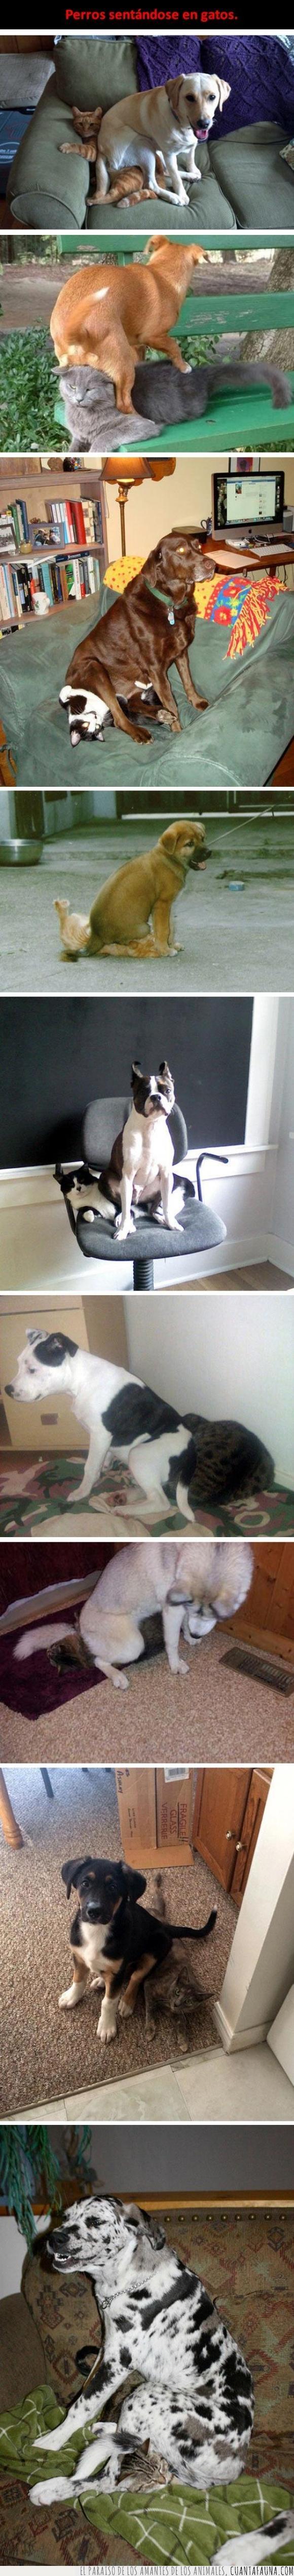 cojín,encima,gato,gatos,genial,perro,sentar,silla